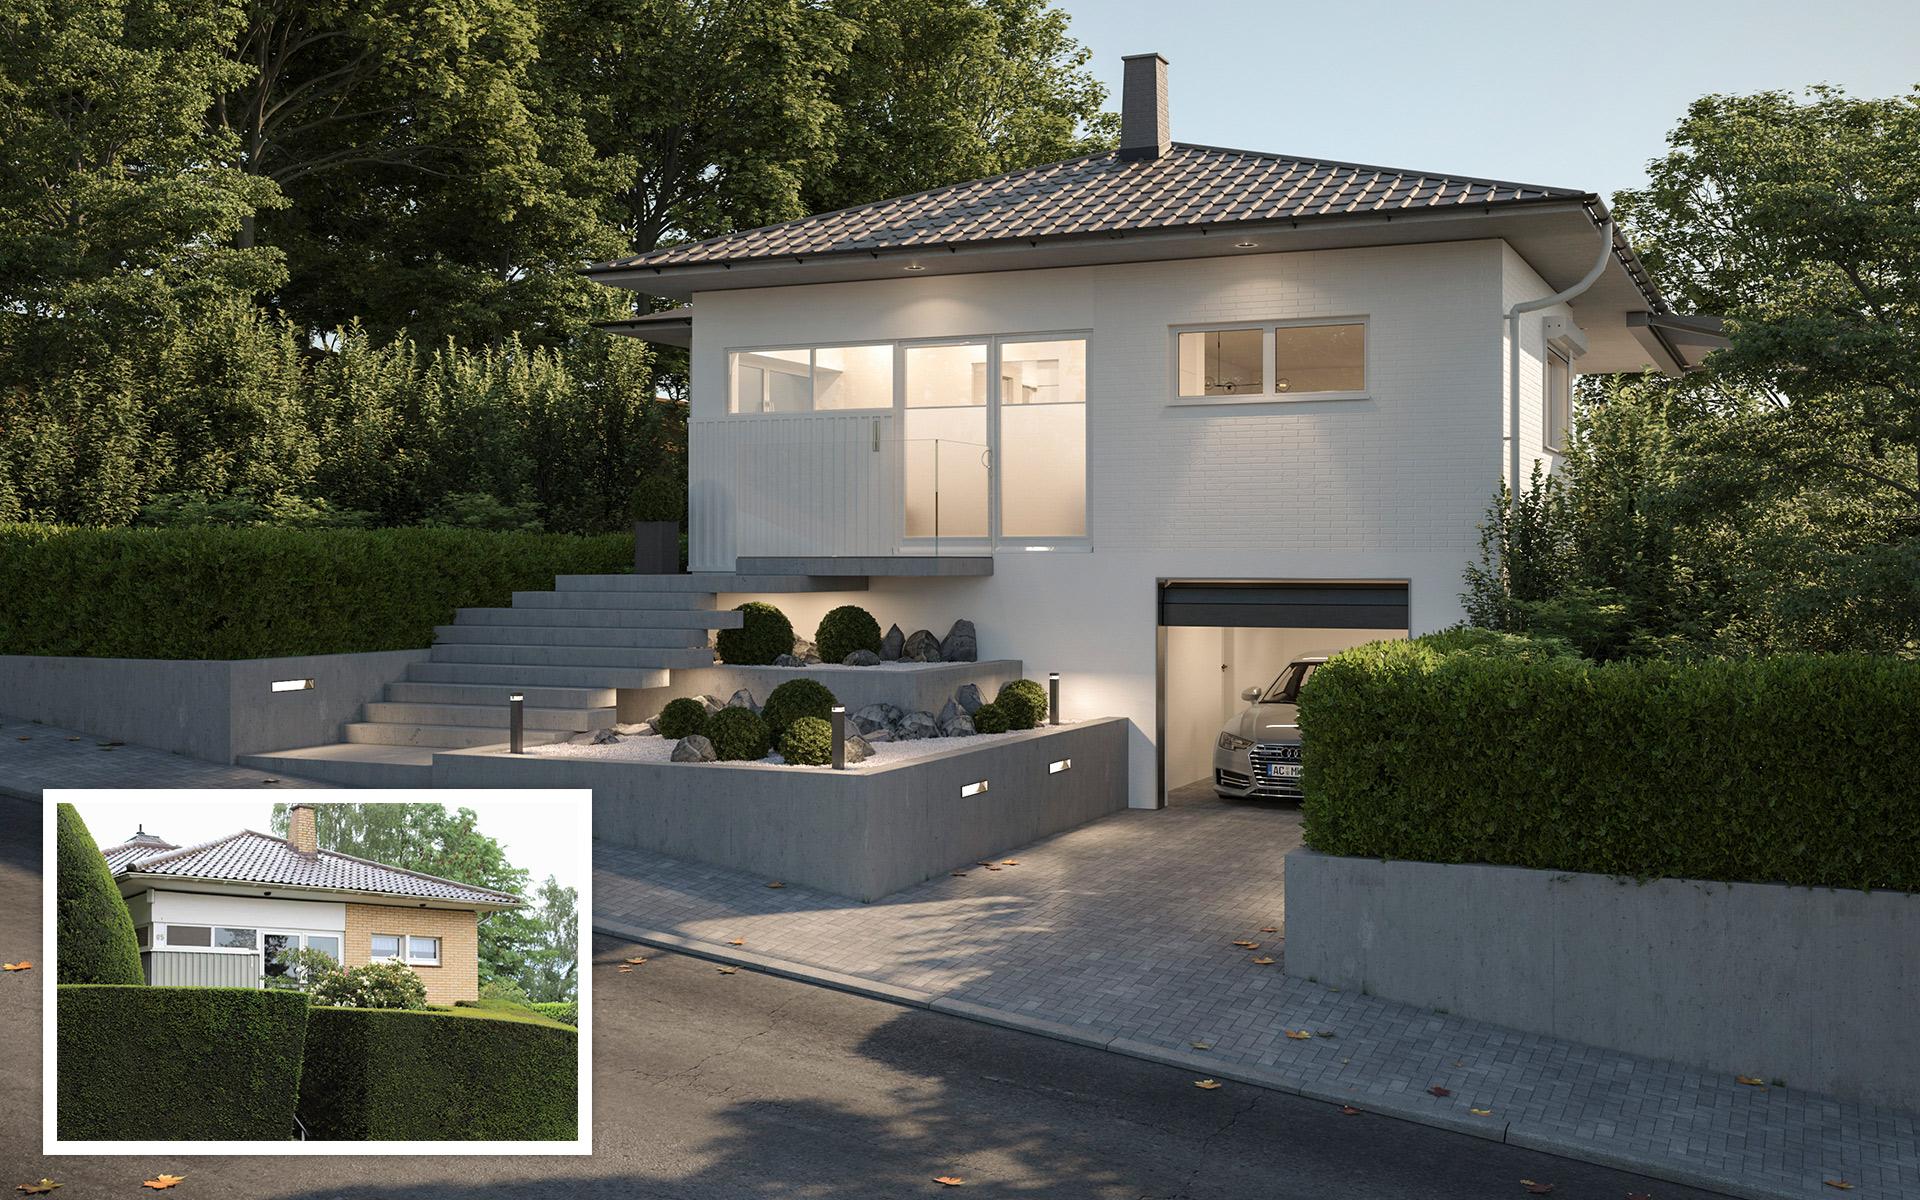 Umplanung Einfamilienhaus